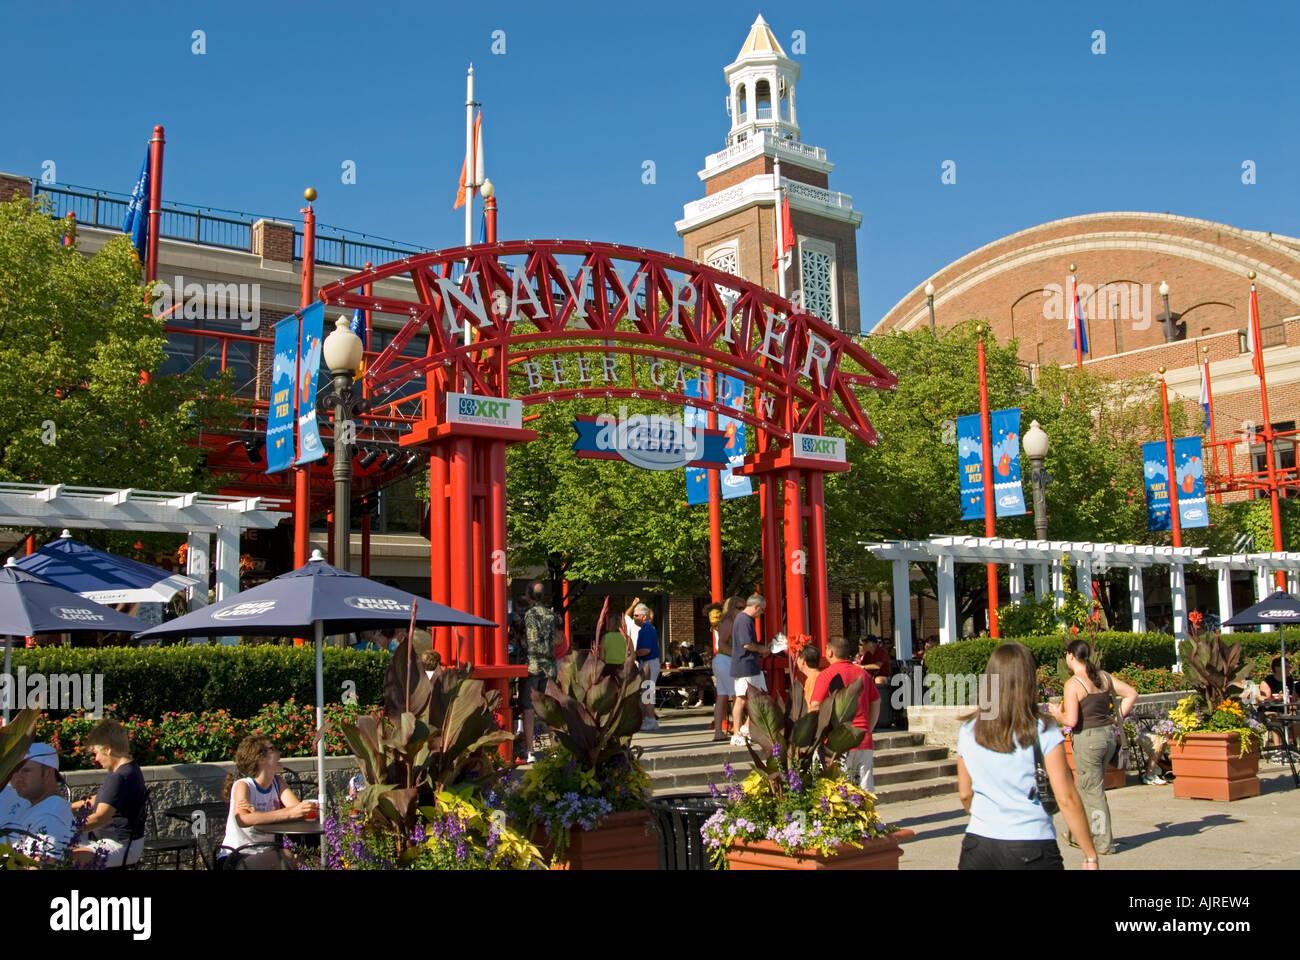 navy pier beer garden chicago illinois usa stock photo 8455699 alamy